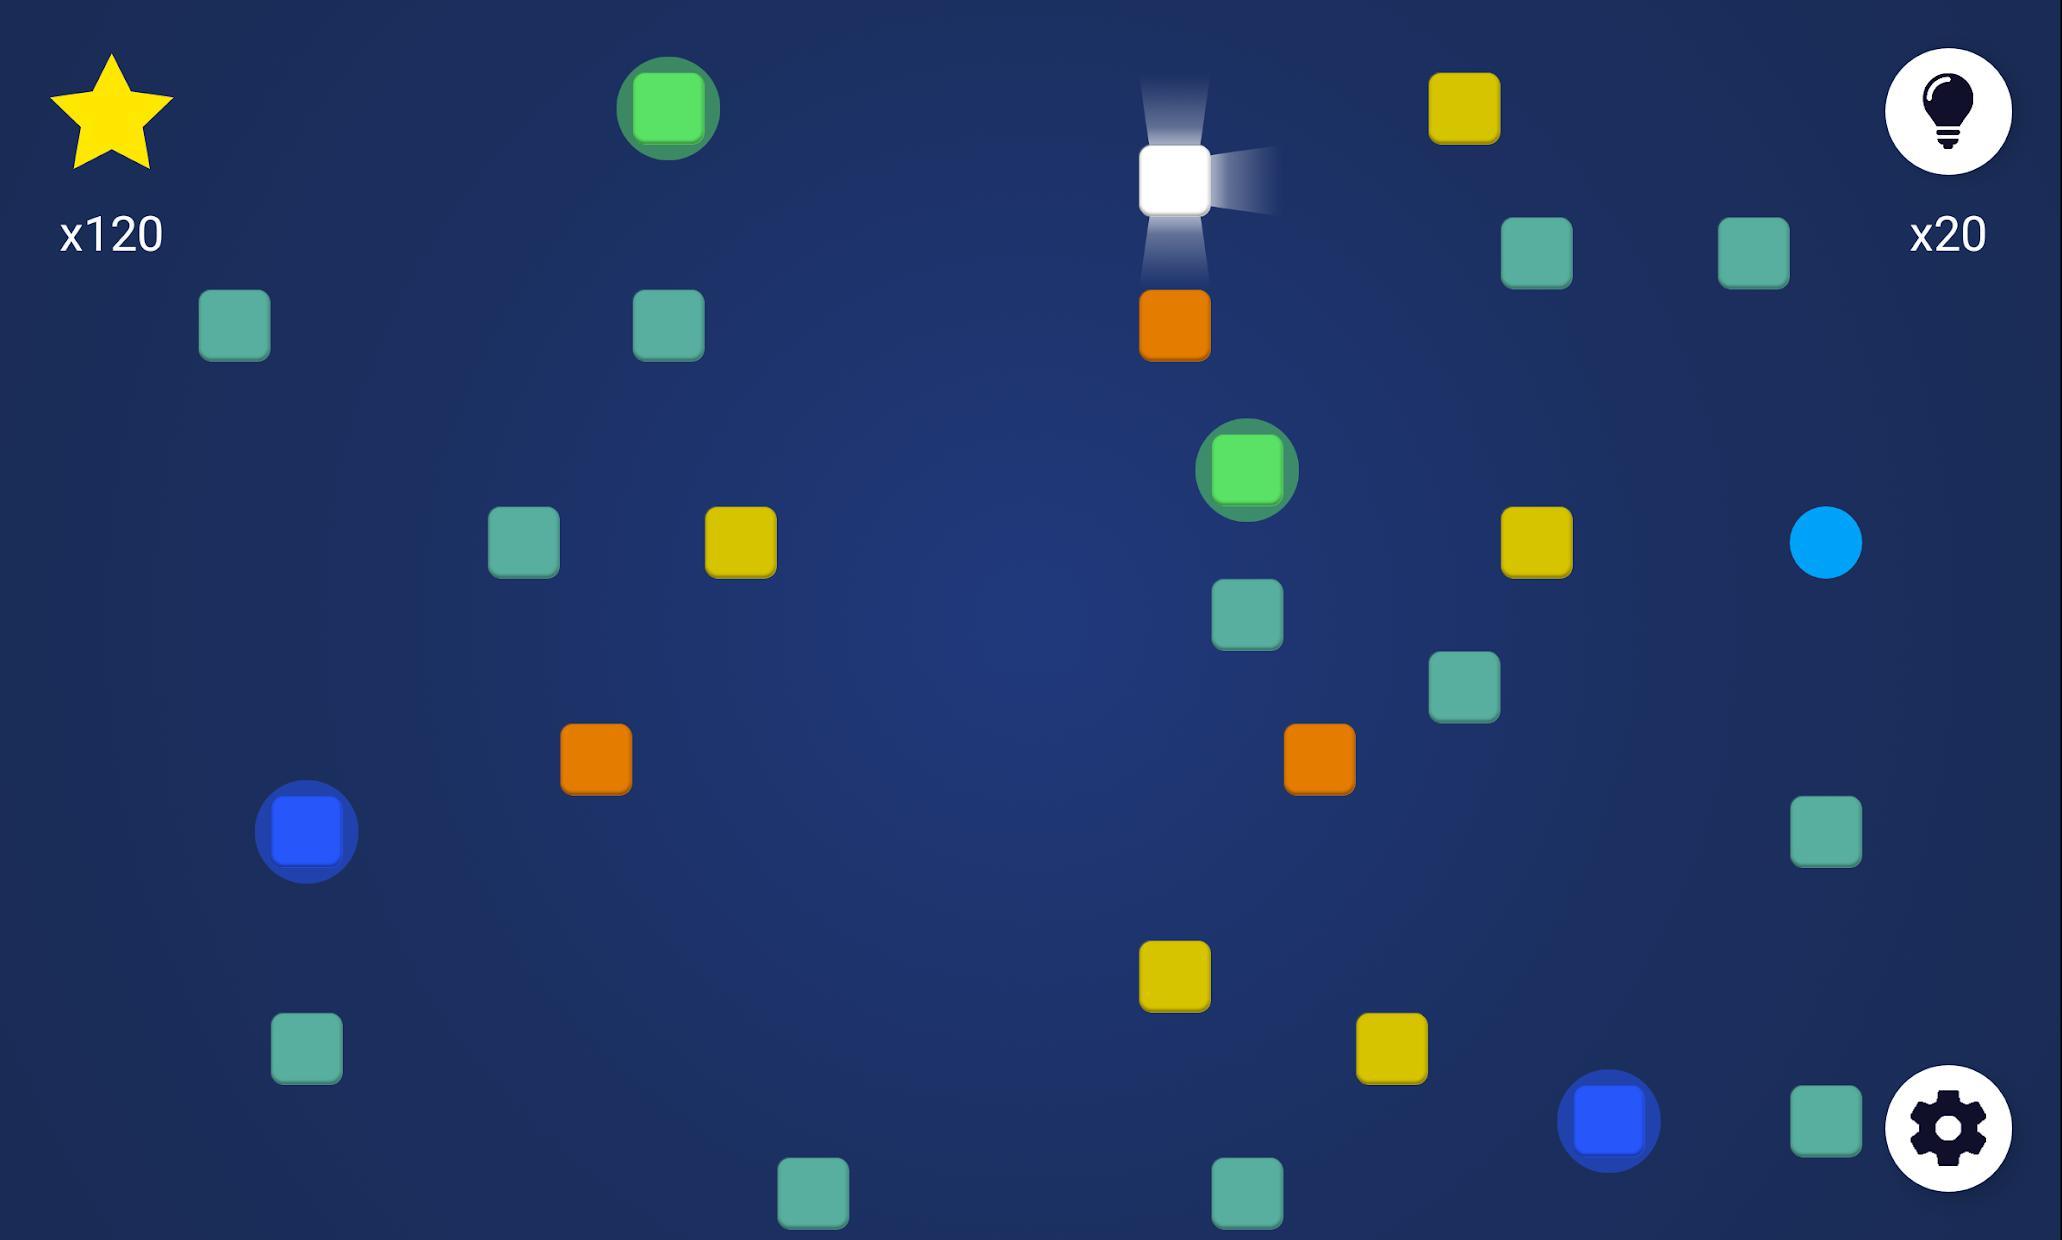 Mindblox - Impossible Slide Puzzle 游戏截图3